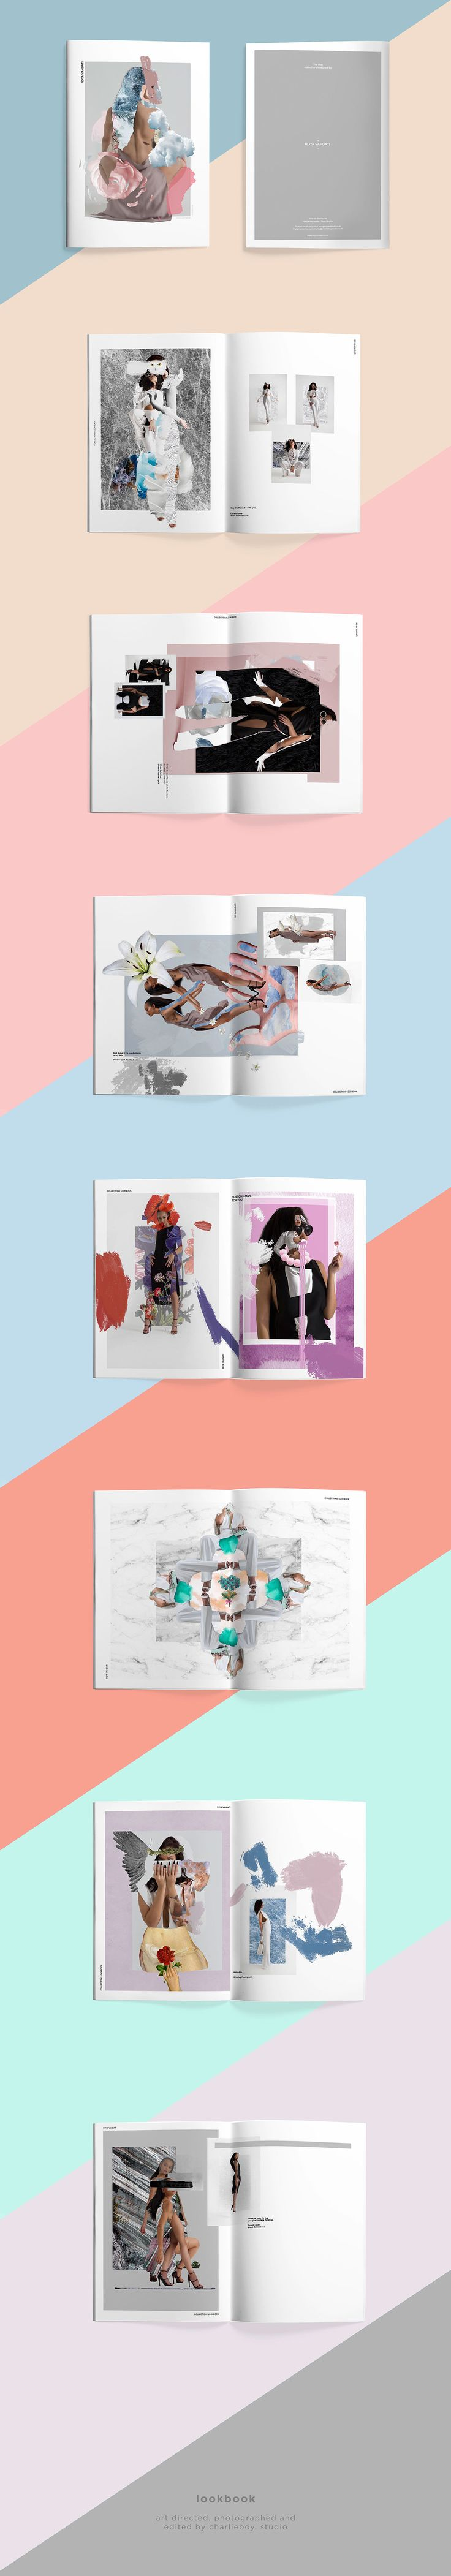 Roya Vahdati - Lookbook & Branding on Behance